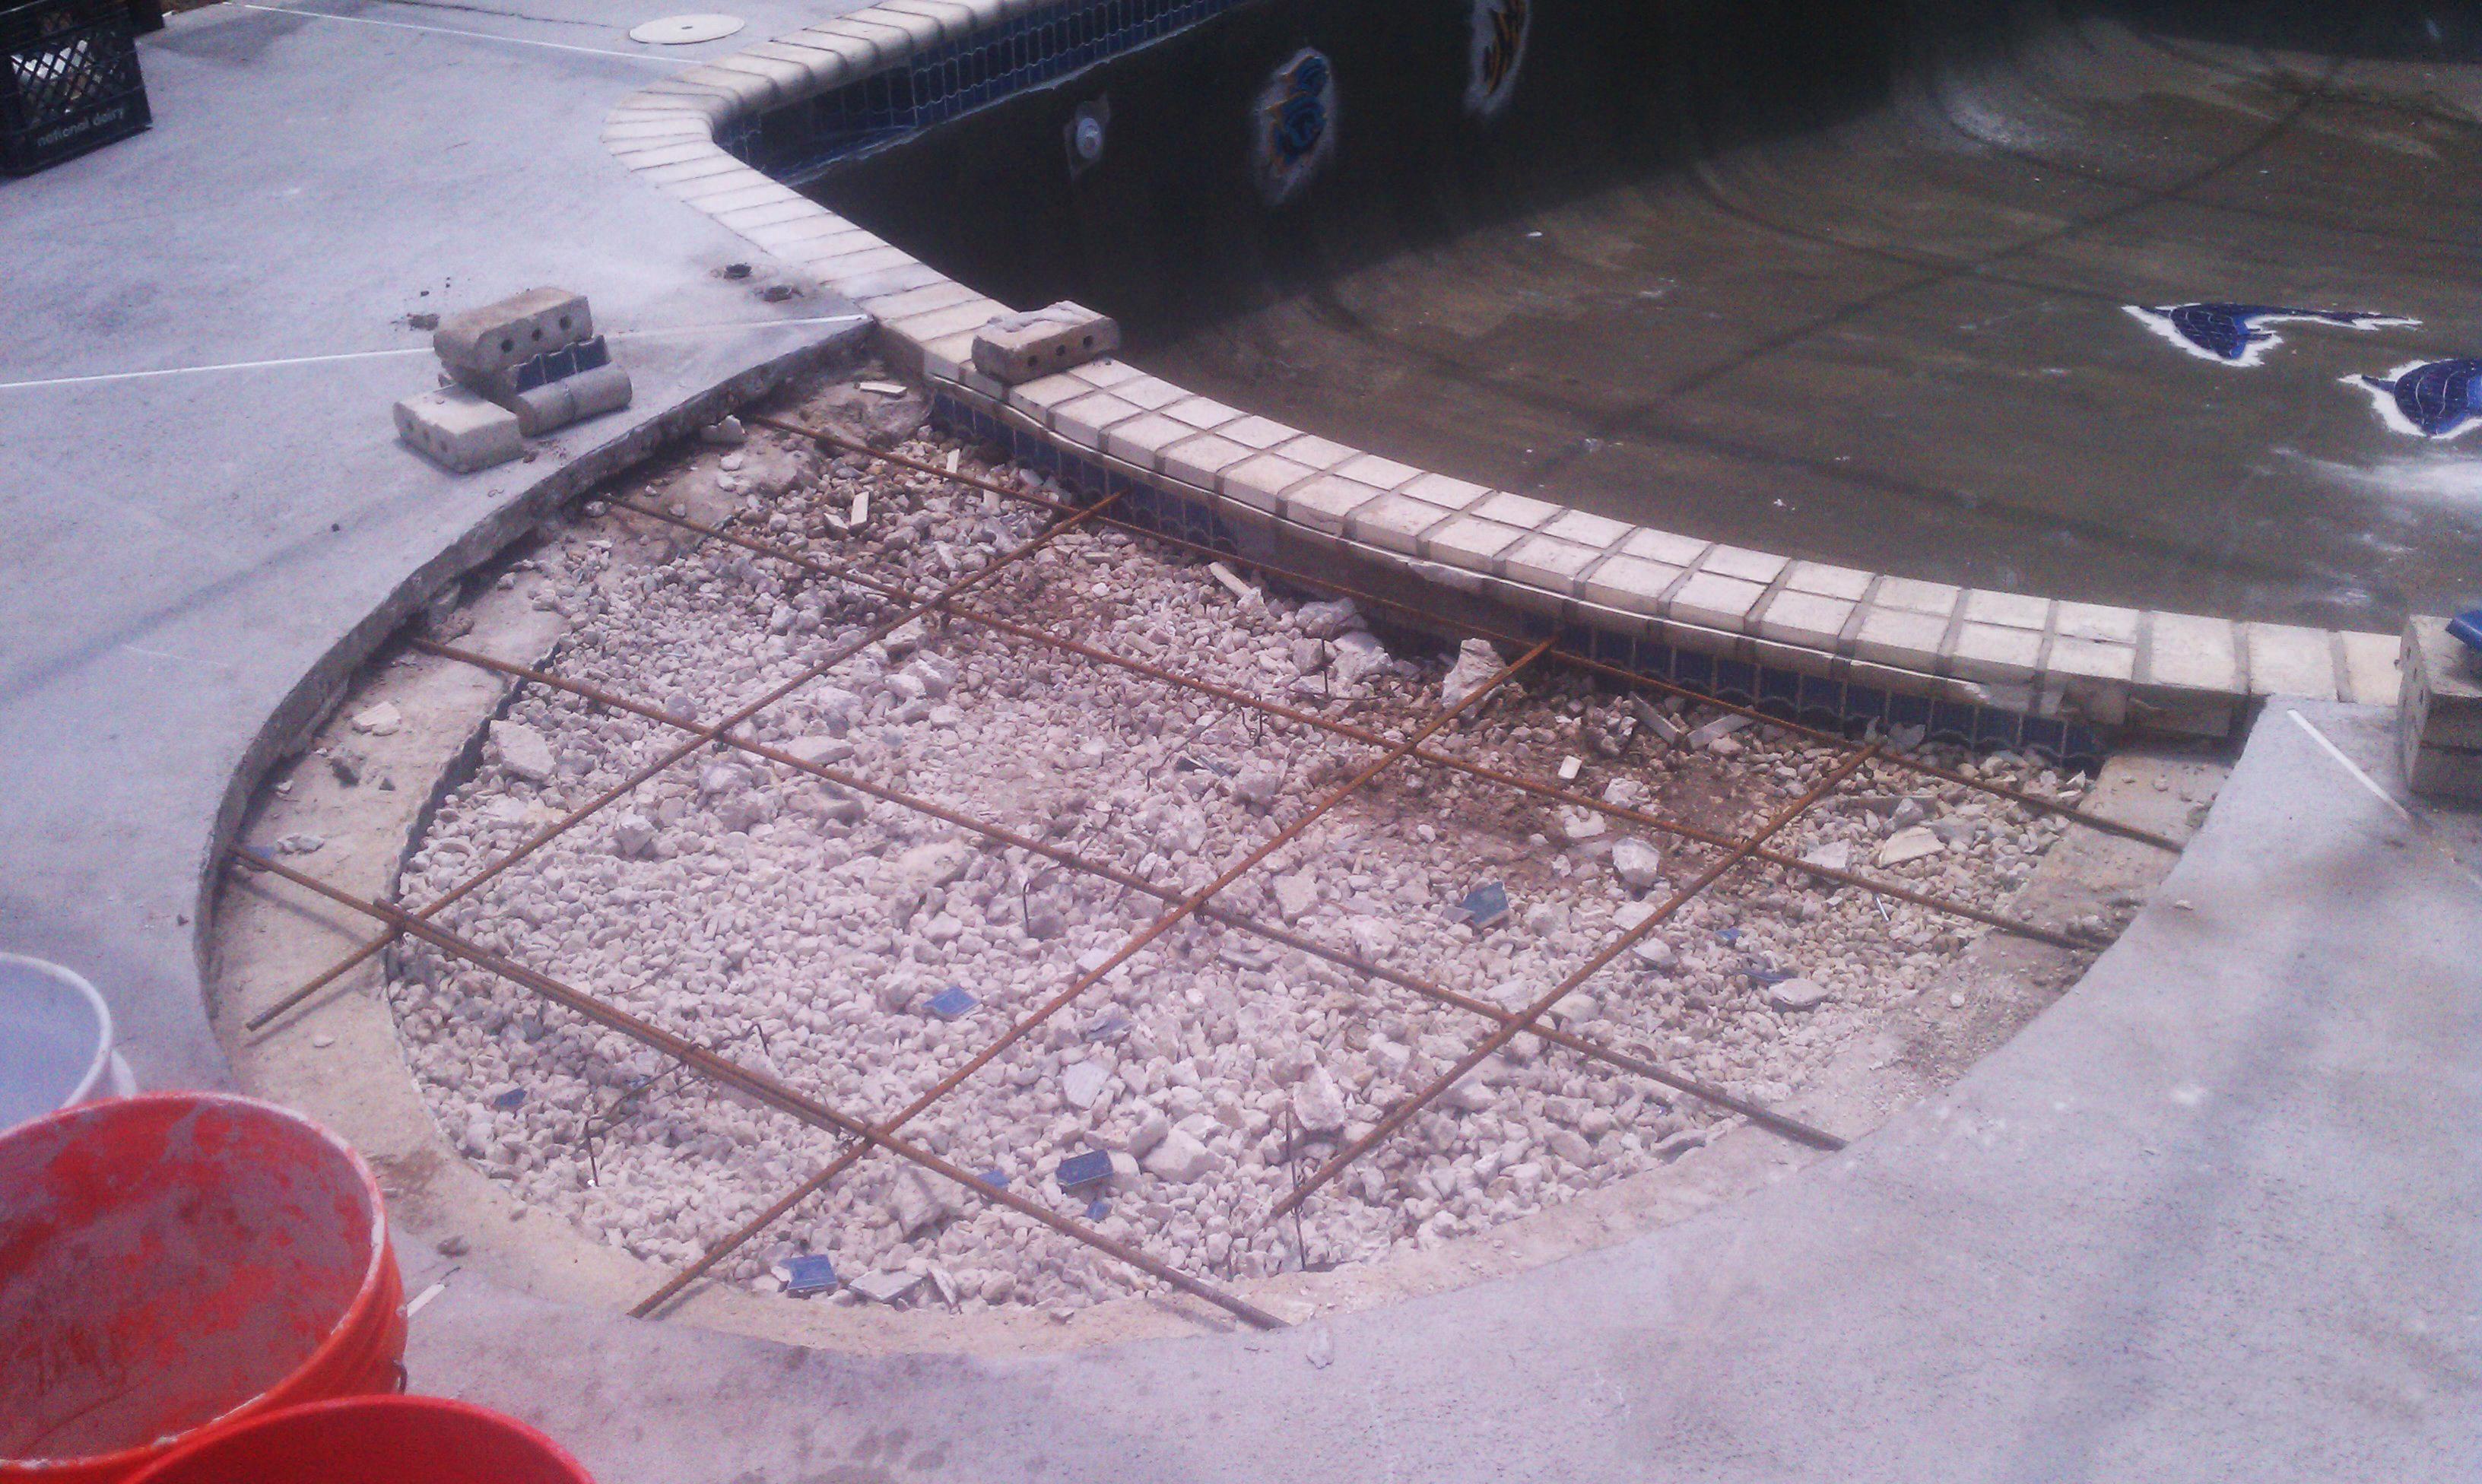 Residential fiberglass pool paint and repair aqua guard 5000 for Epoxy pool paint